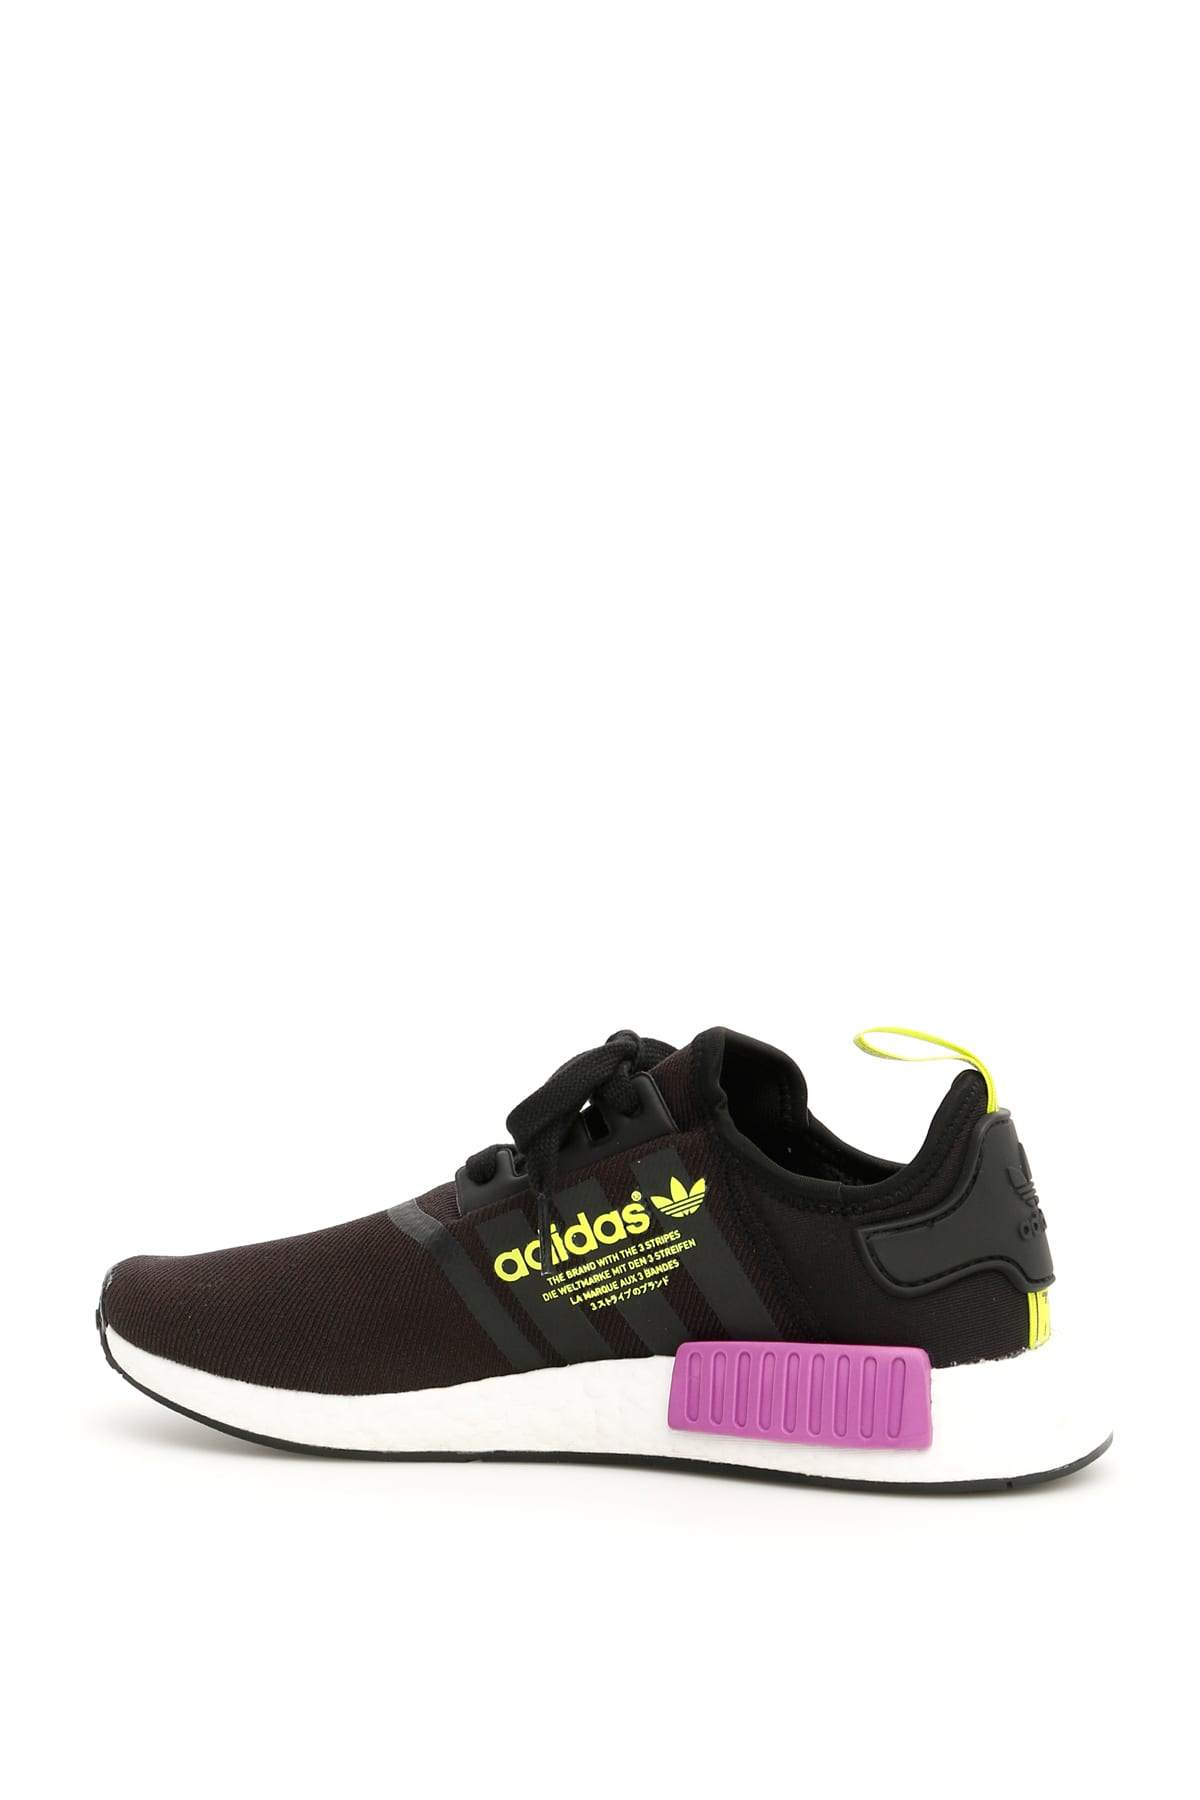 huge discount ba50c d4ab6 Adidas Nmd R1 Sneakers